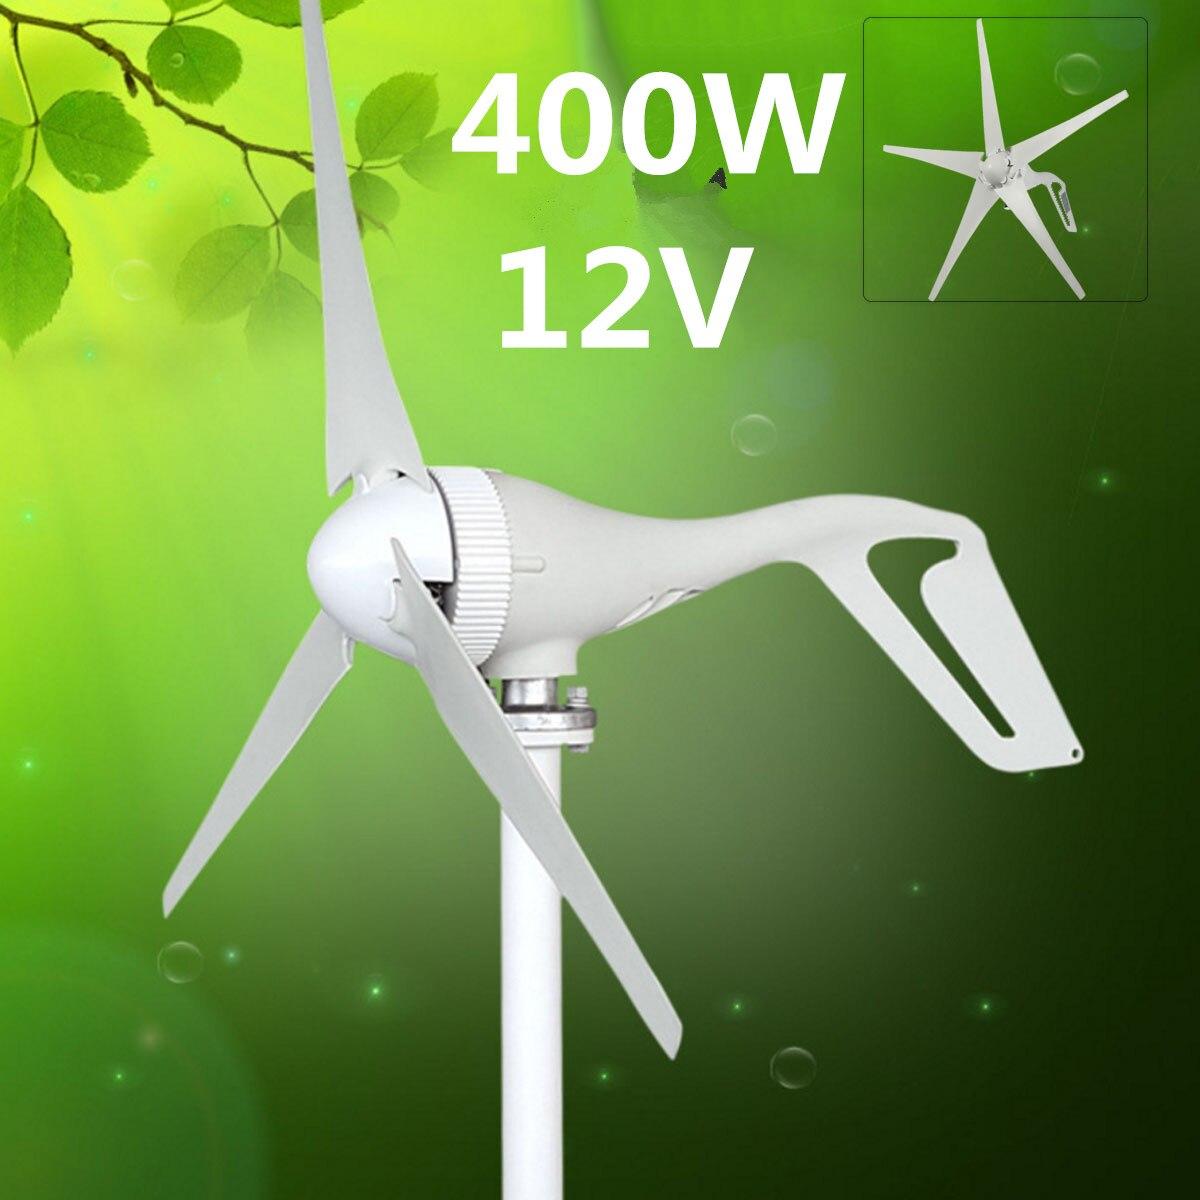 DC 12V Max 600W Wind Tur bine Generator 5 Blade Household Wind Generator 12V/24V 600W Permanent Magnet Generator Tu rbine